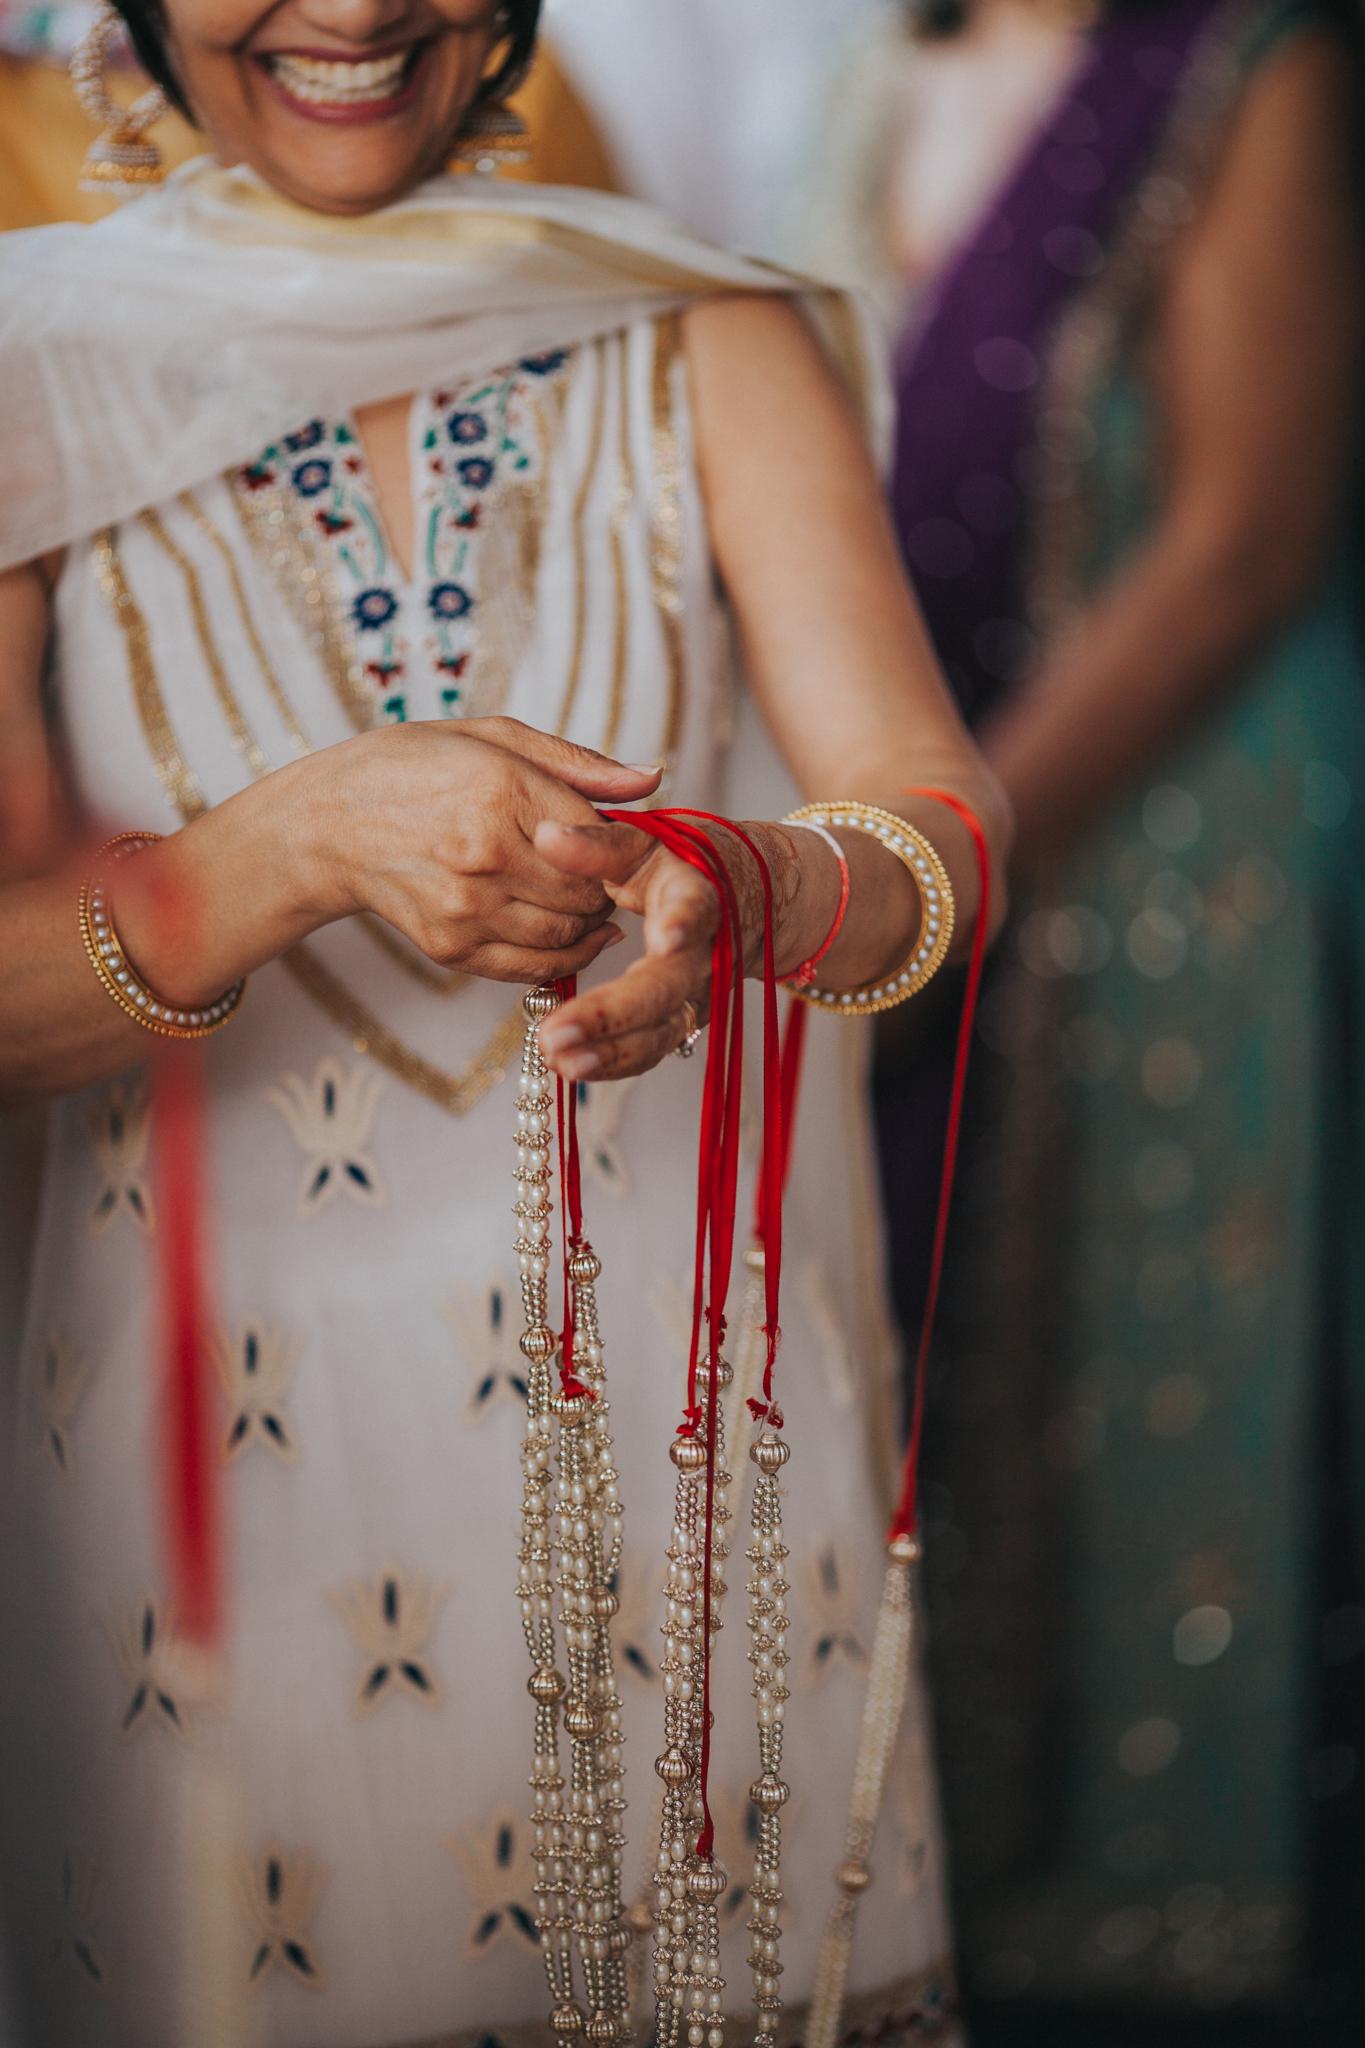 jessicajag_wedding_blush246.jpg